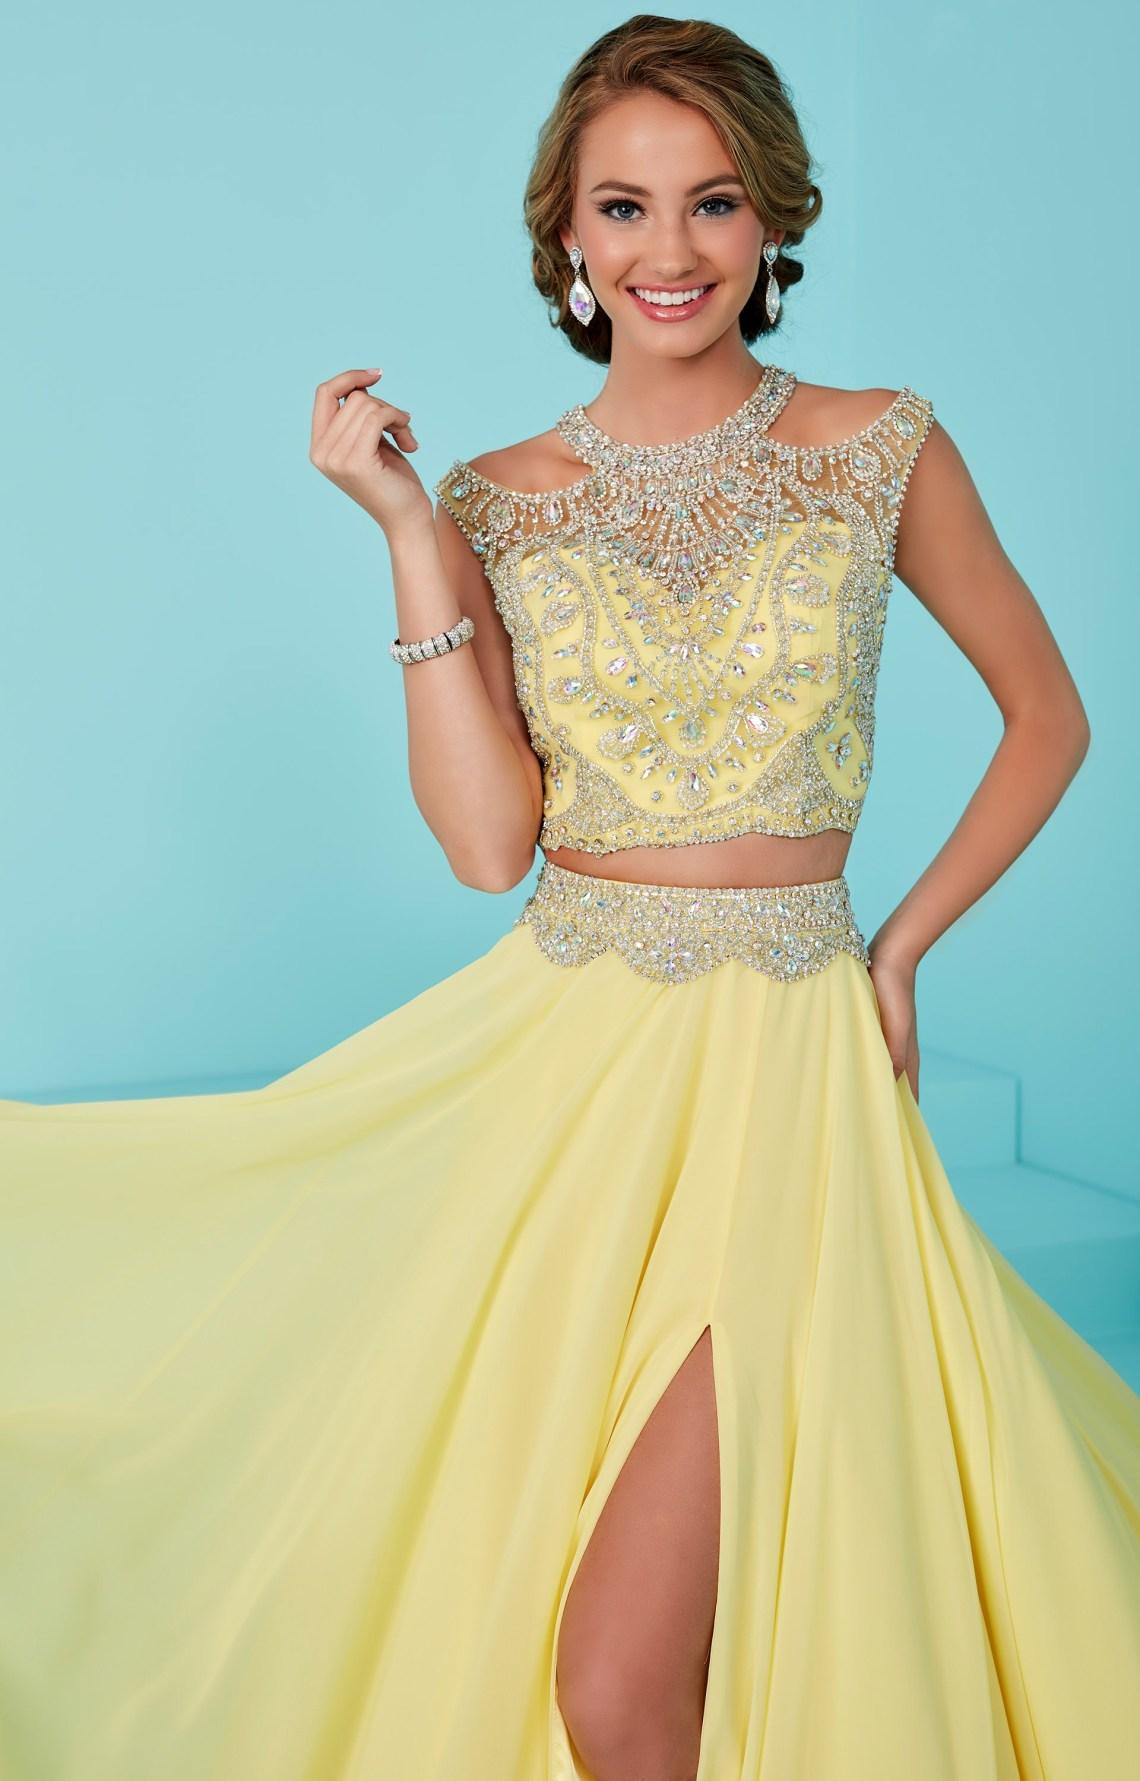 Tiffany Designs 16202 - 2 Piece Dress with High Slit Prom ...